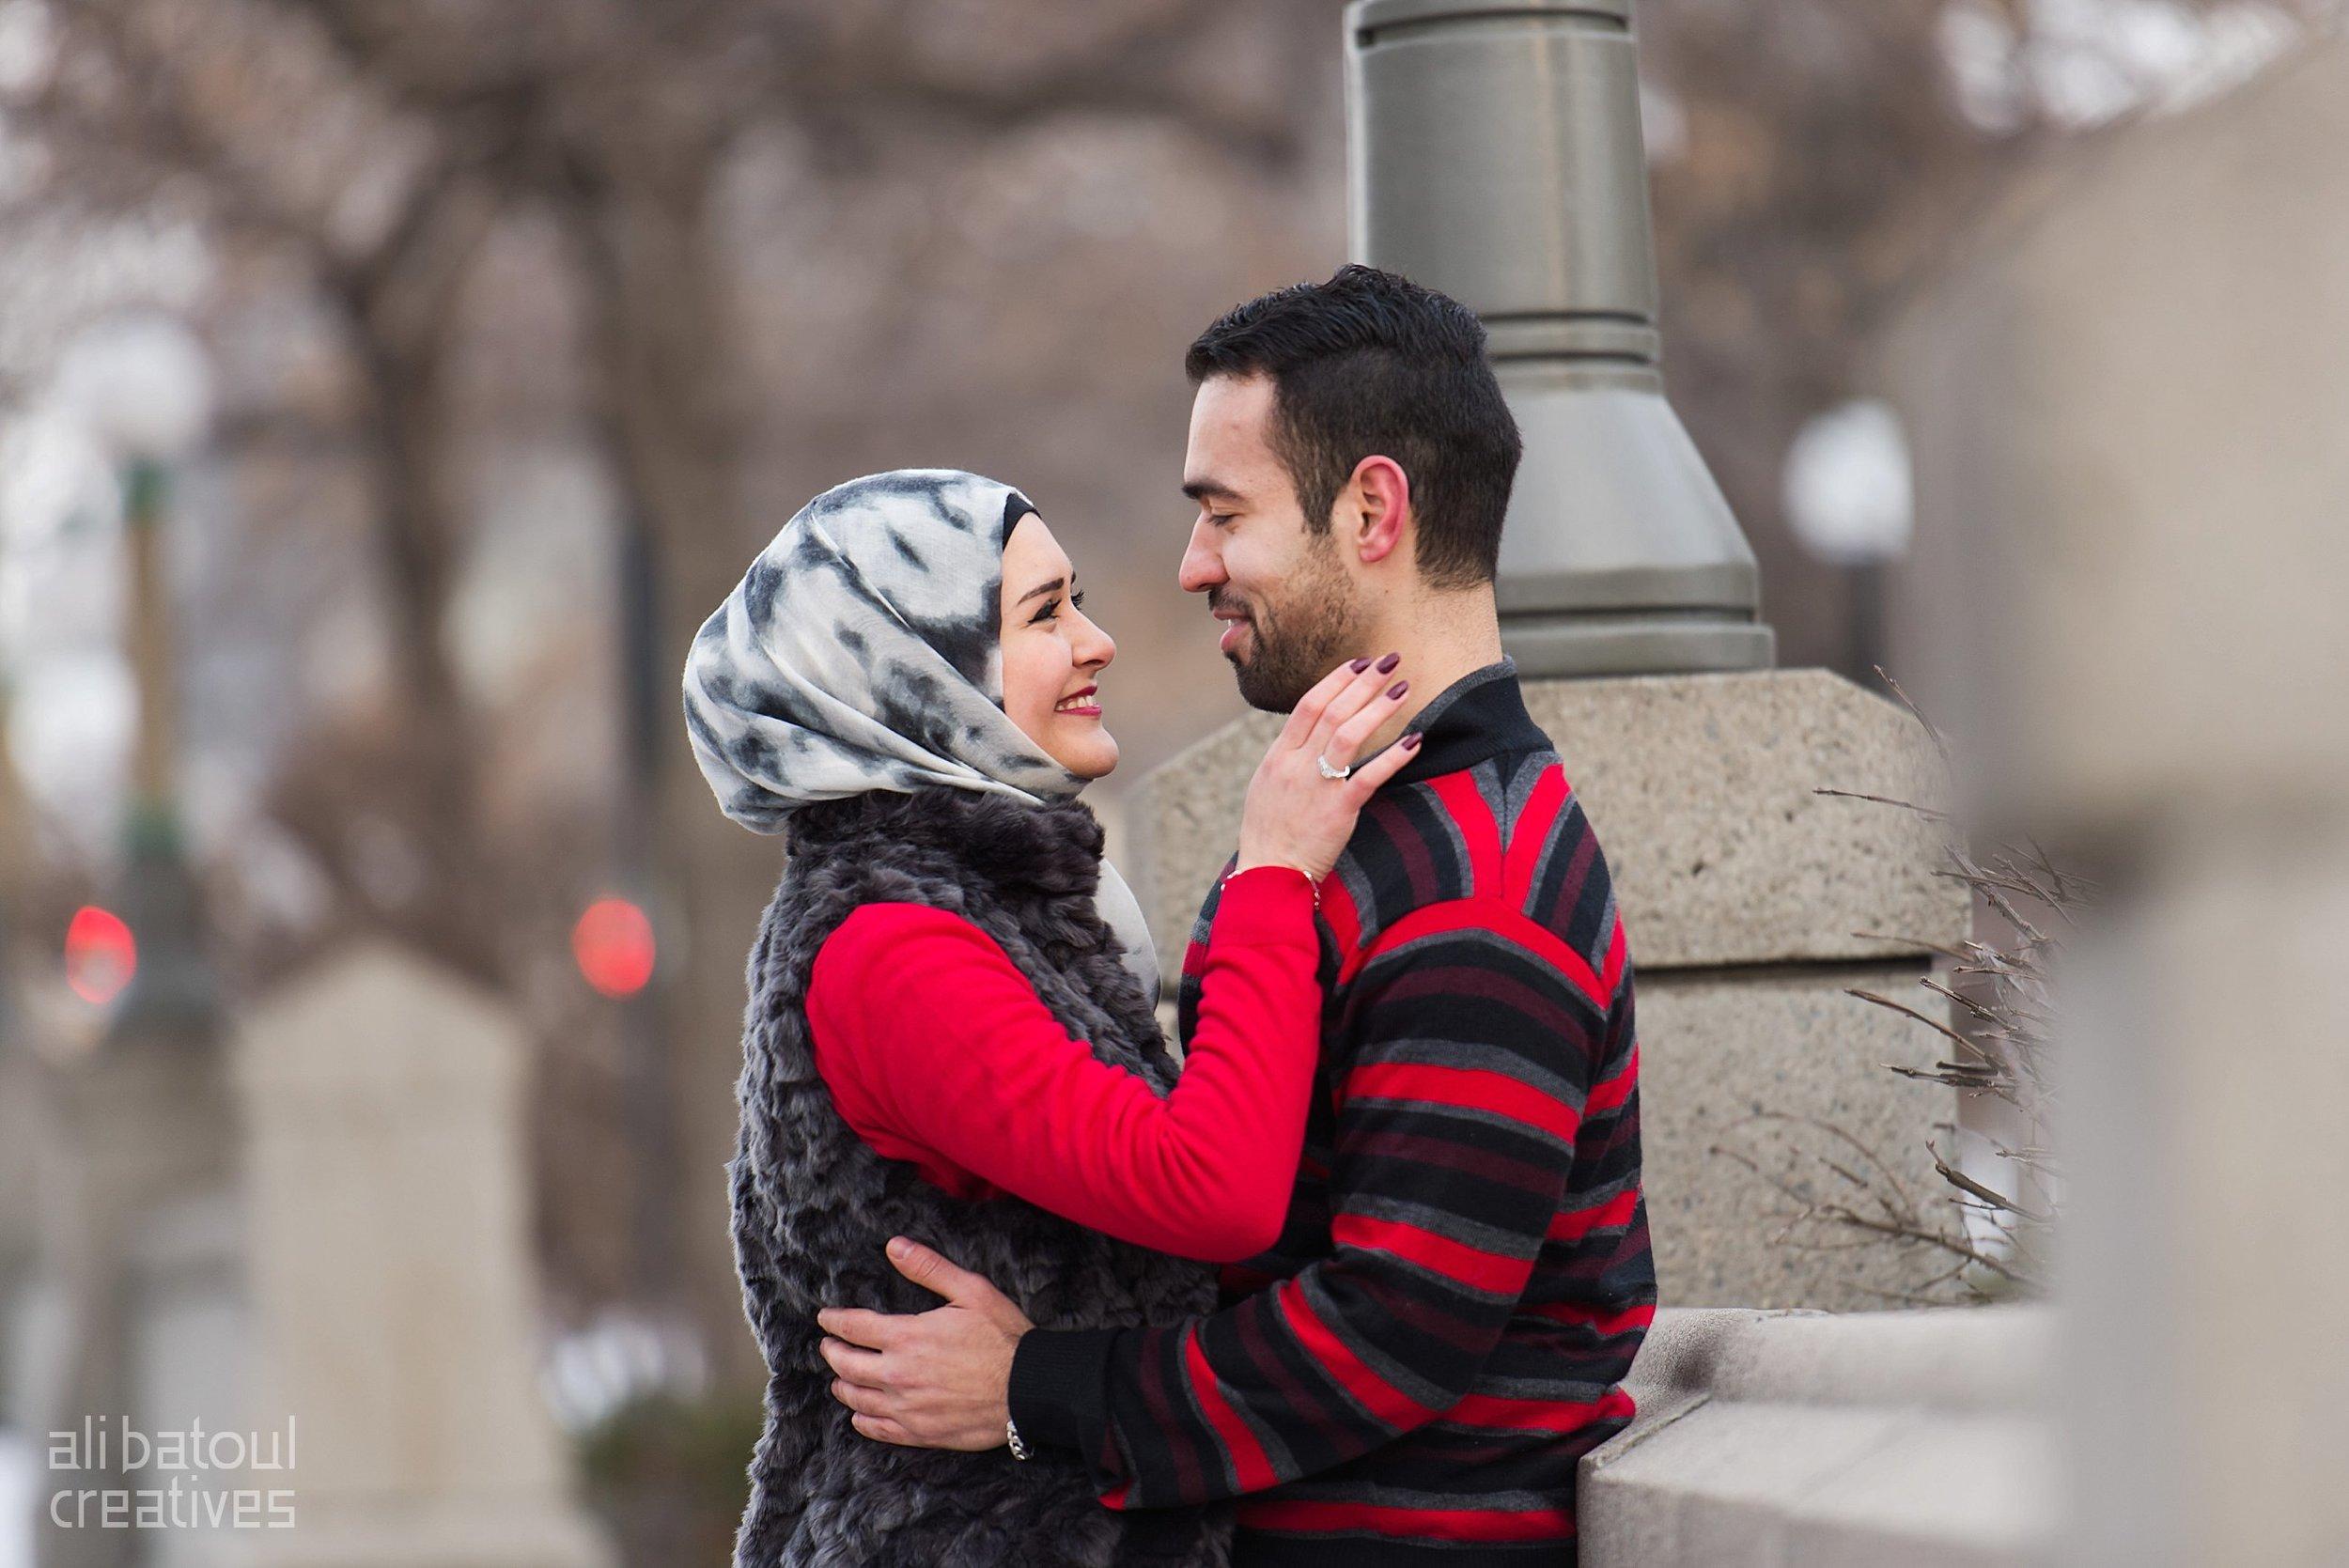 Hanan + Said Engagement - Ali Batoul Creatives Photography_0027.jpg